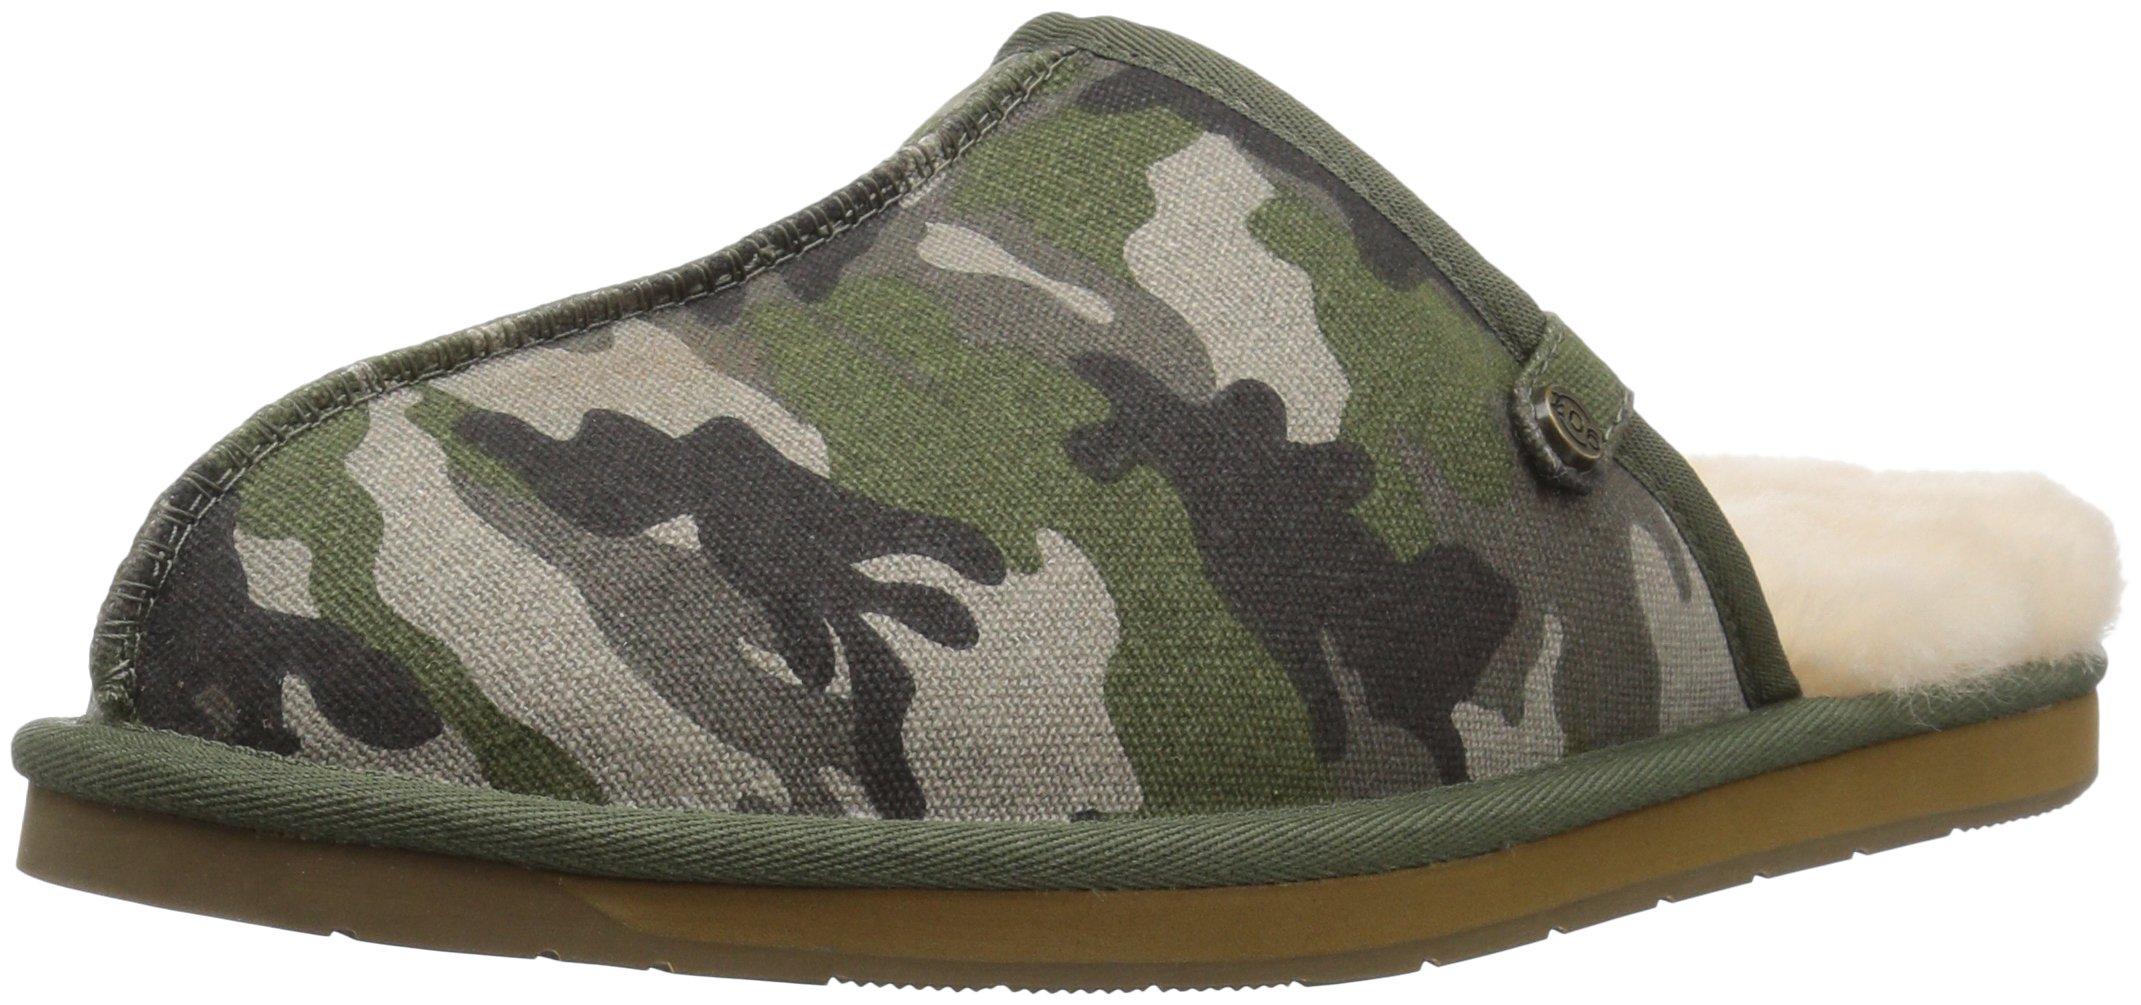 206 Collective Men's Union Shearling Slide Slipper Shoe, Green camo, 10 D US